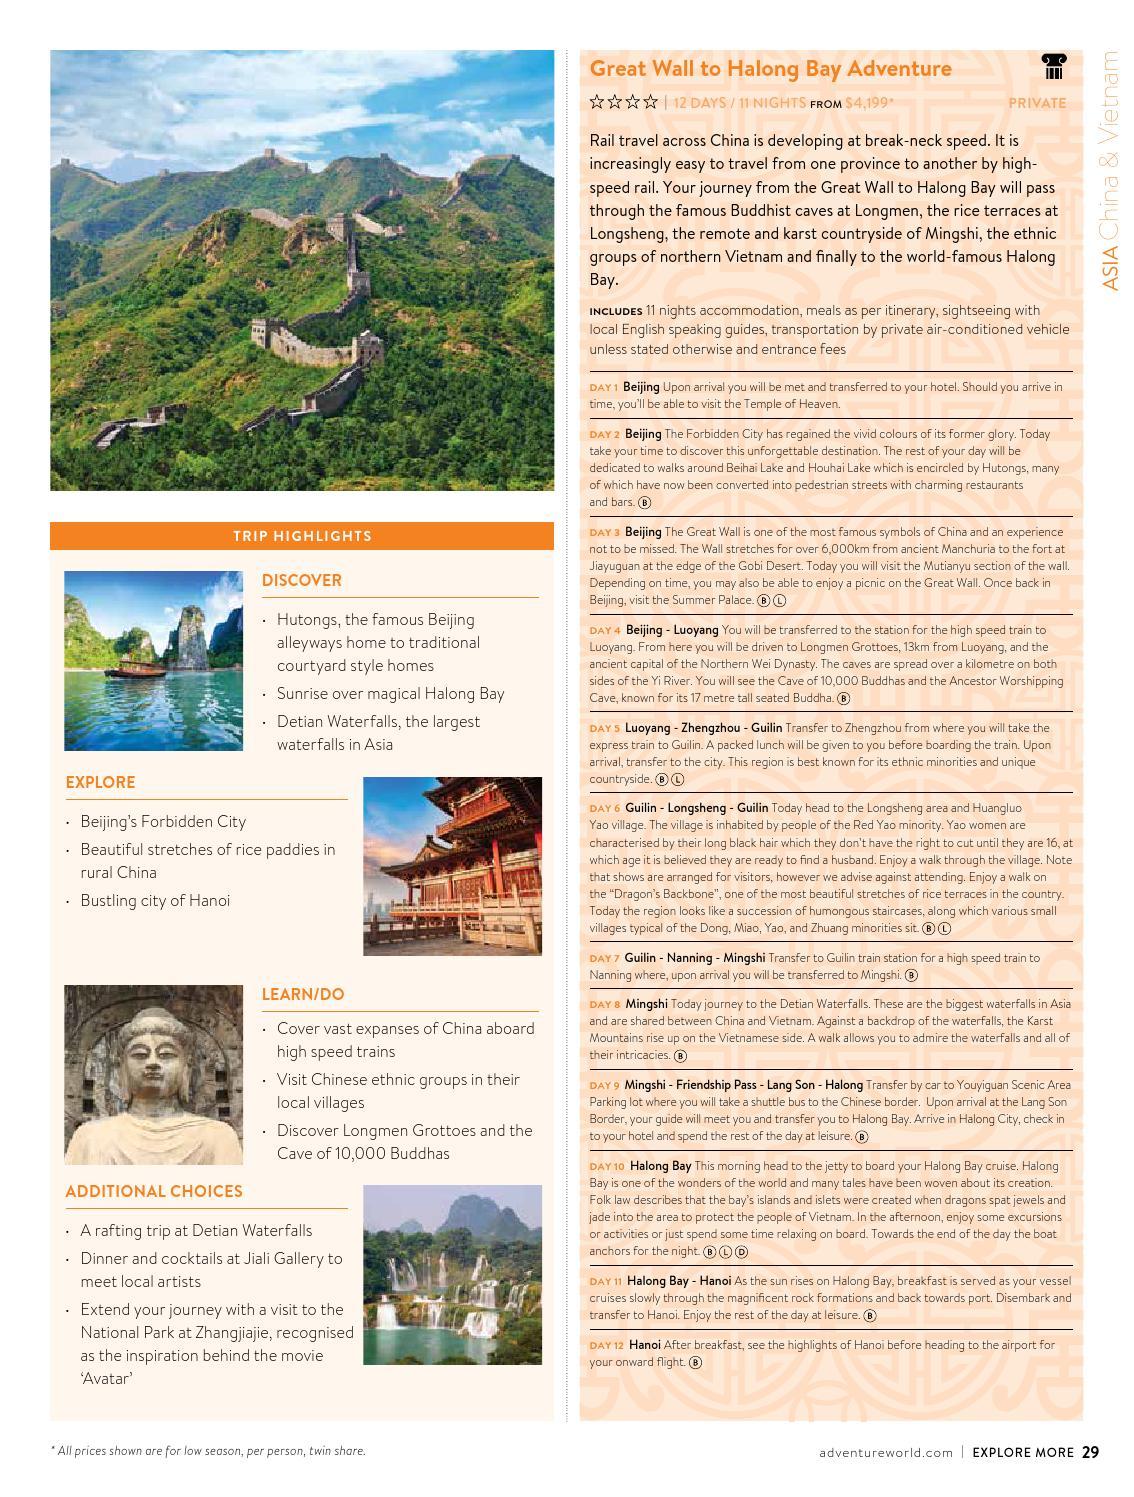 Adventure world 2015 asia india by AdvWorld - issuu